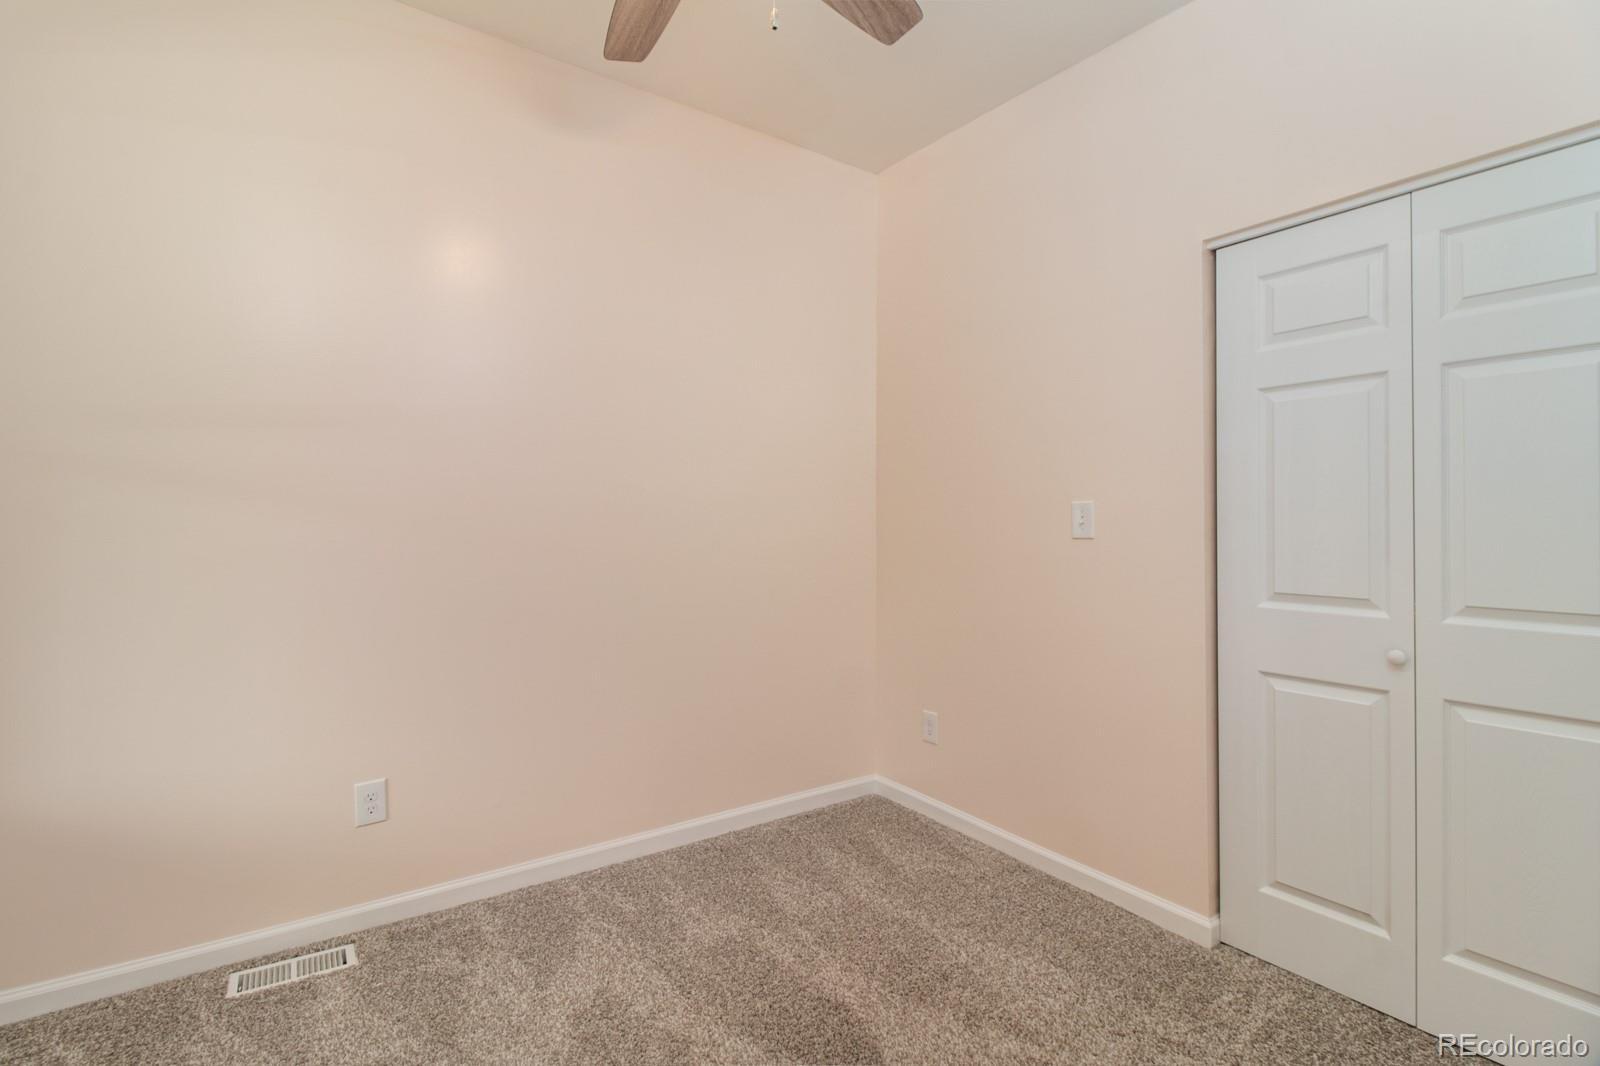 MLS# 5509479 - 15 - 322 S Logan Street, Denver, CO 80209